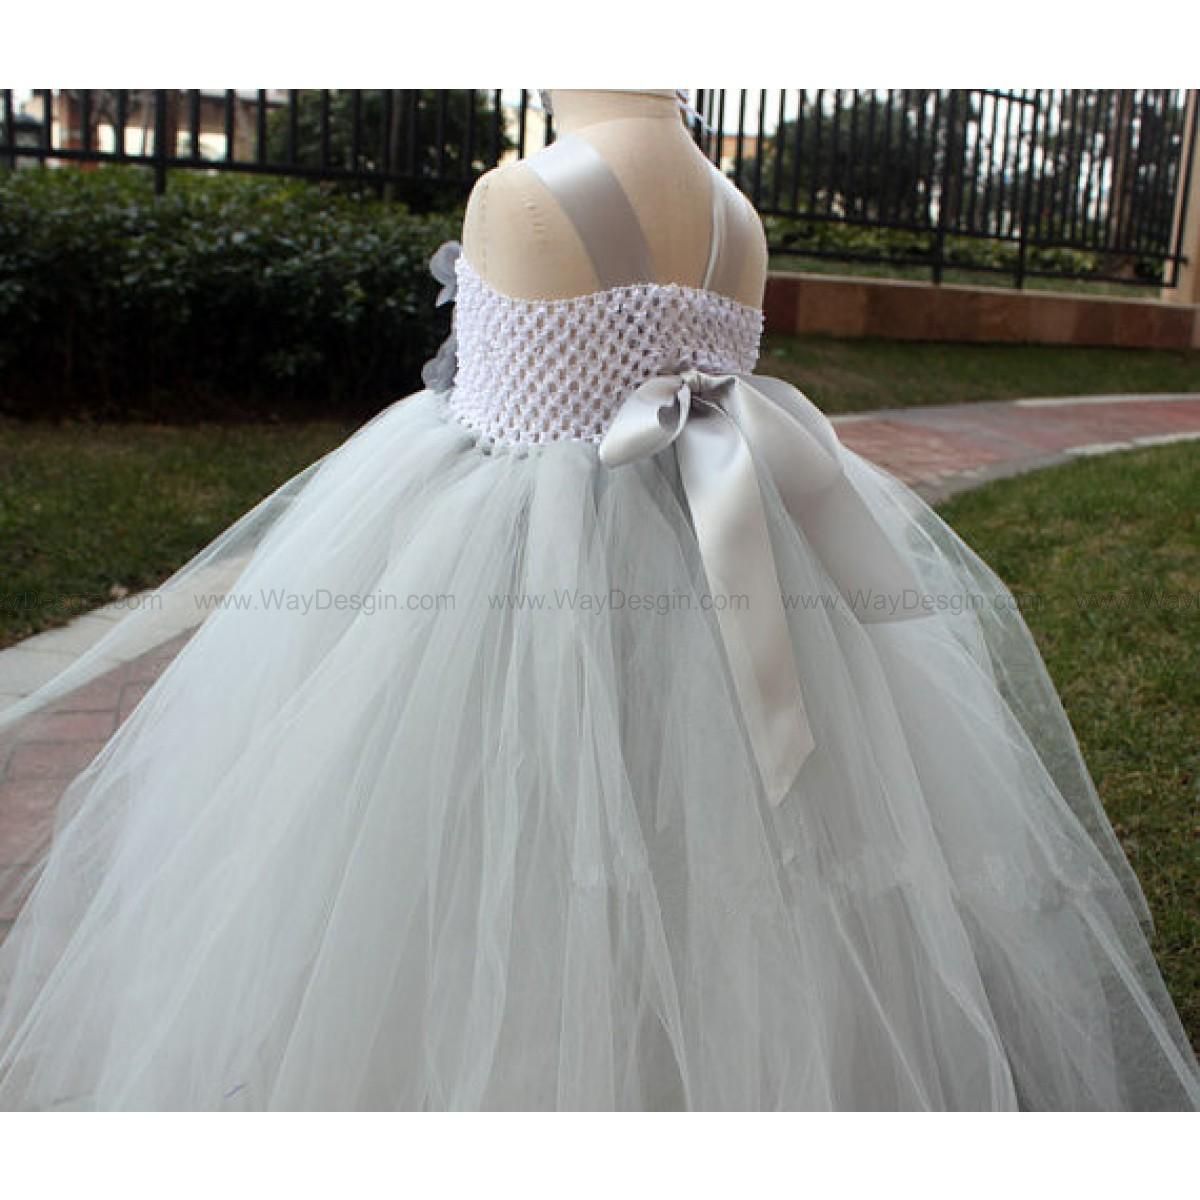 Grey flower girl tutu dress baby dress toddler birthday dress wedding tutu dress with headband newborn